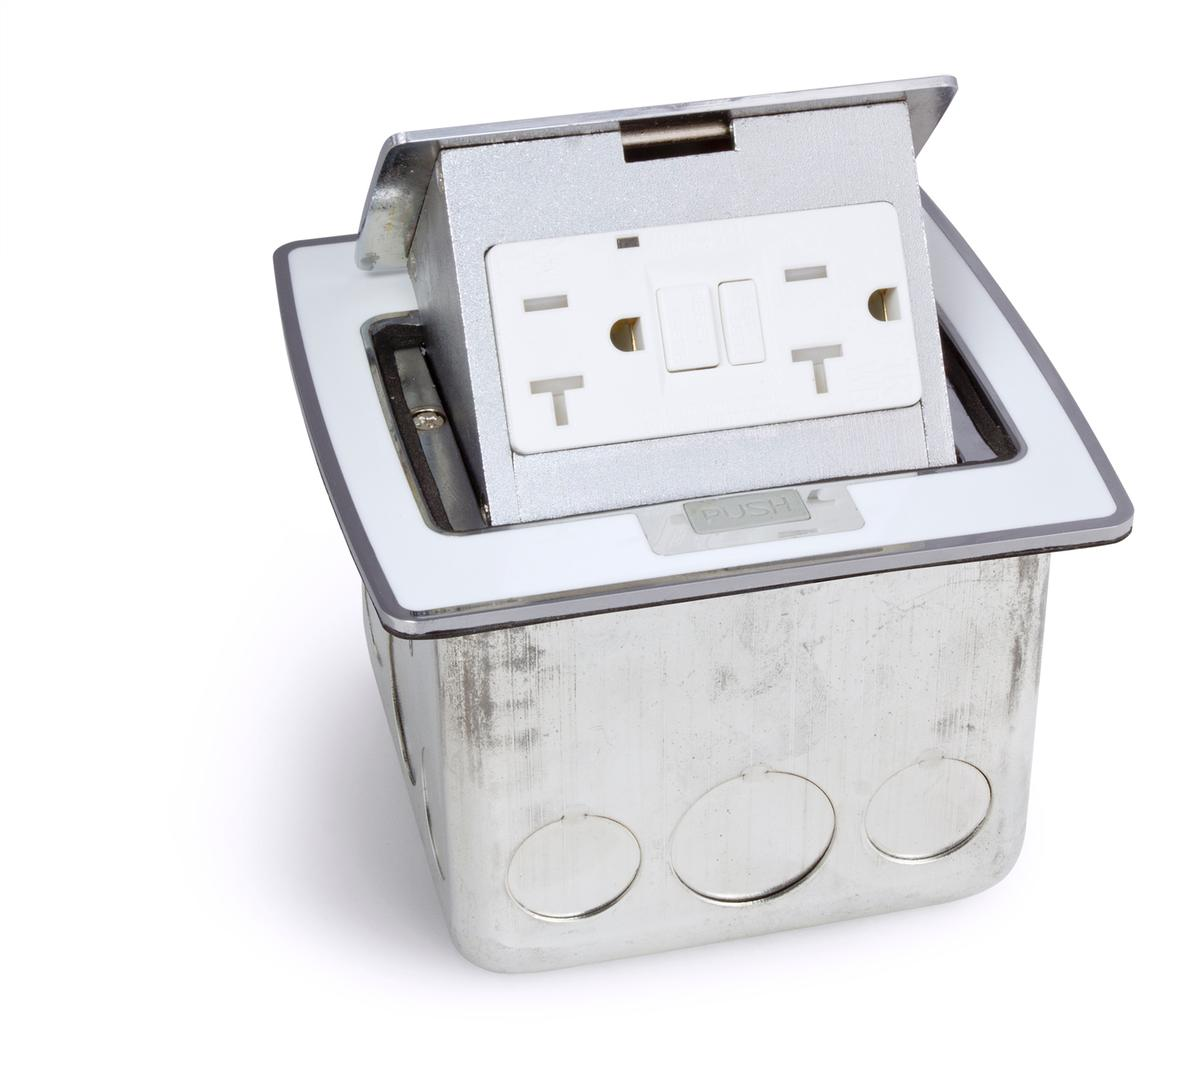 Lew Electric Pufp Ct Bk Nl Tilting Table Box W 2 Power